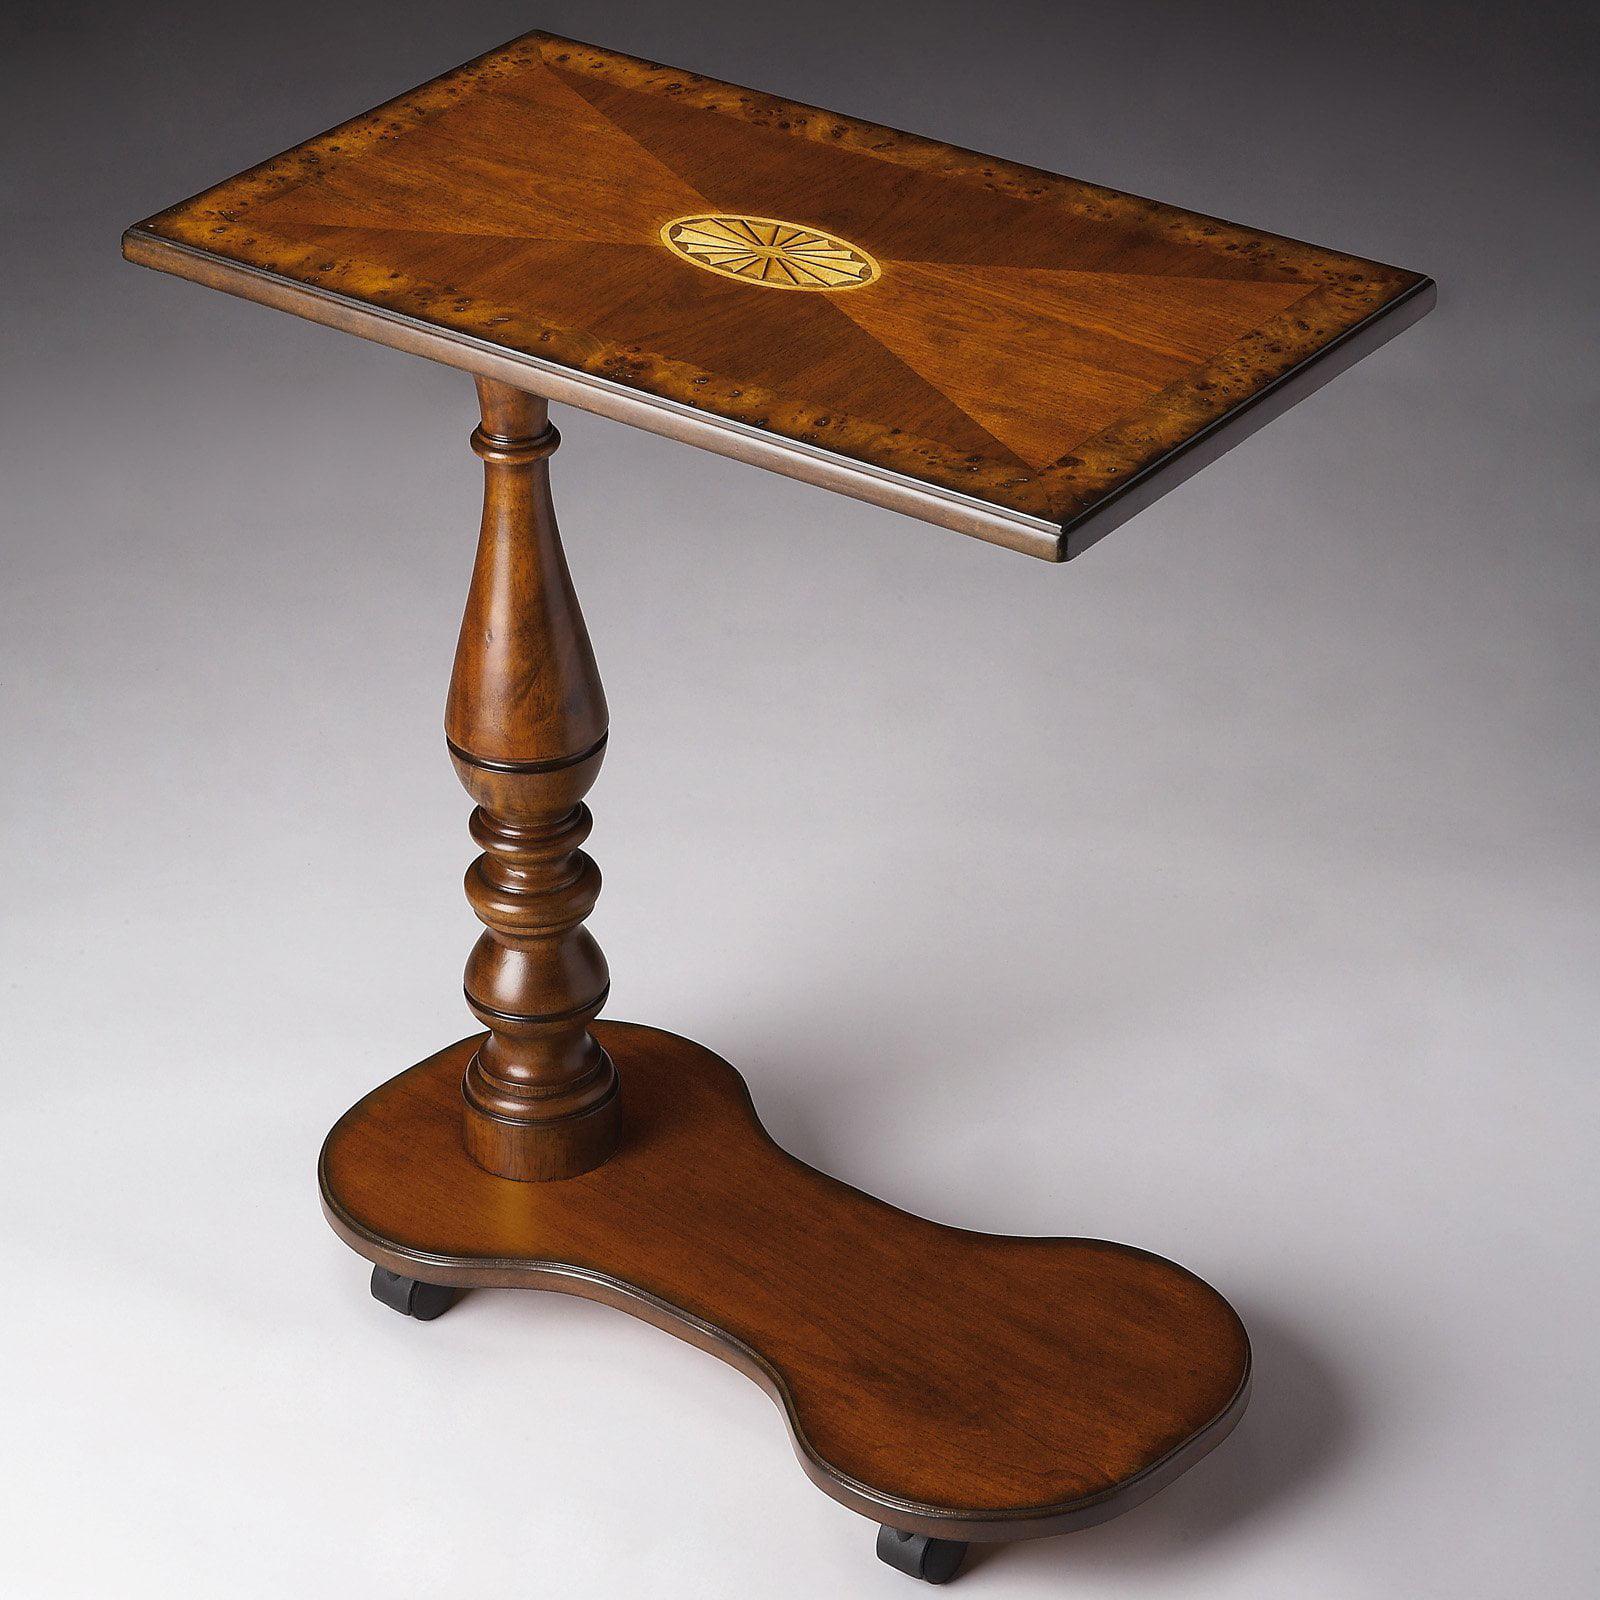 Butler Mobile Tray Table - Olive Ash Burl